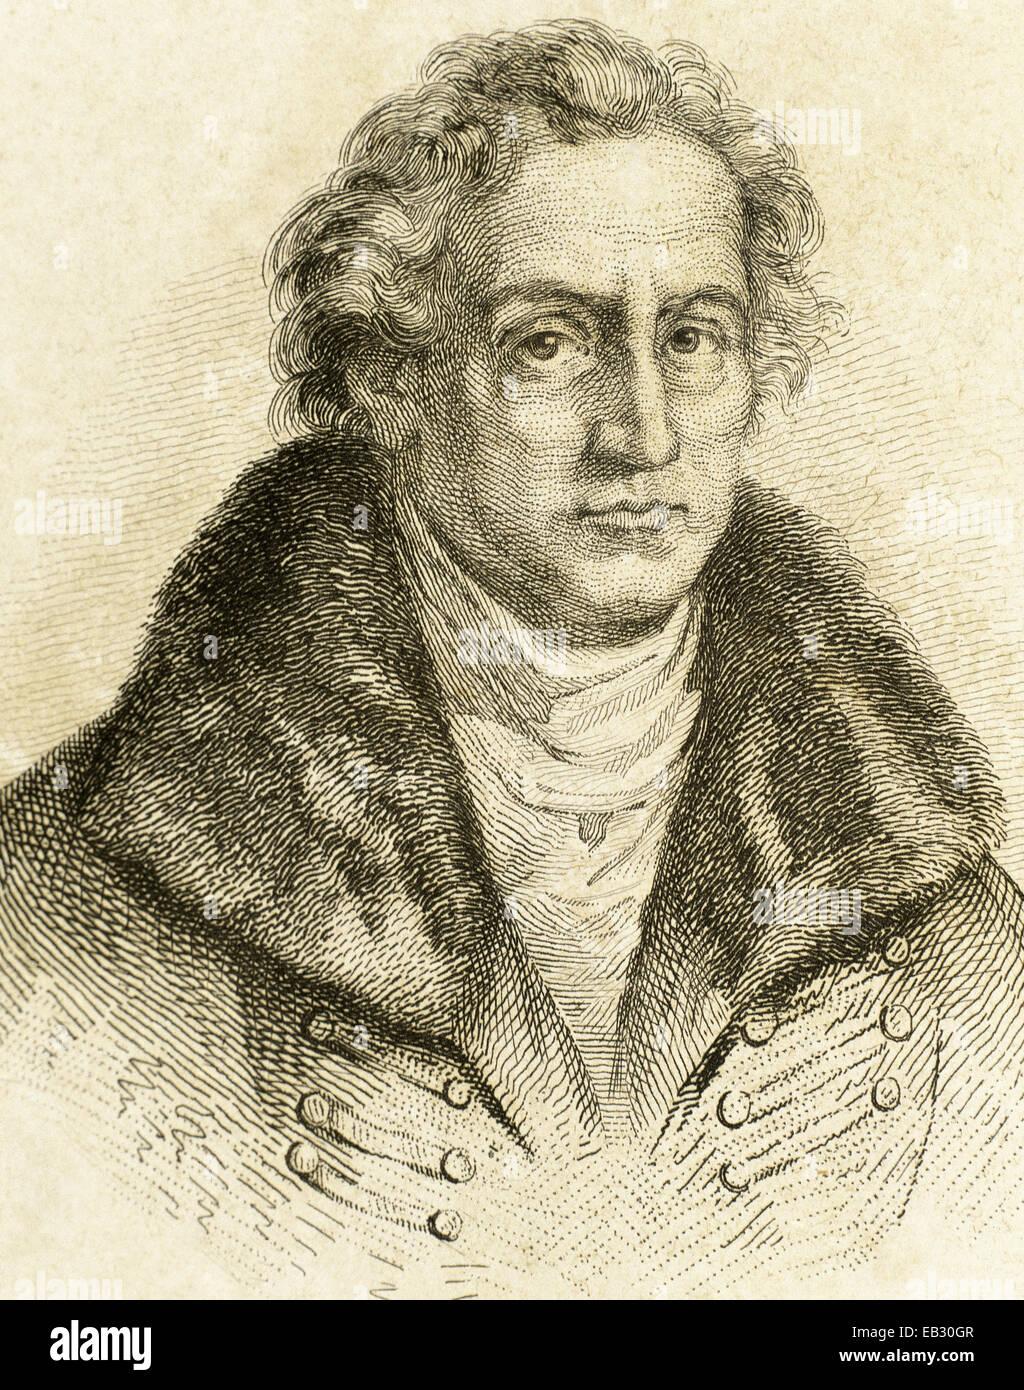 Johann Wolfgang von Goethe (1749-1832). German writer. Weimar Classicism. Engraving, 19th C. Portrait. - Stock Image